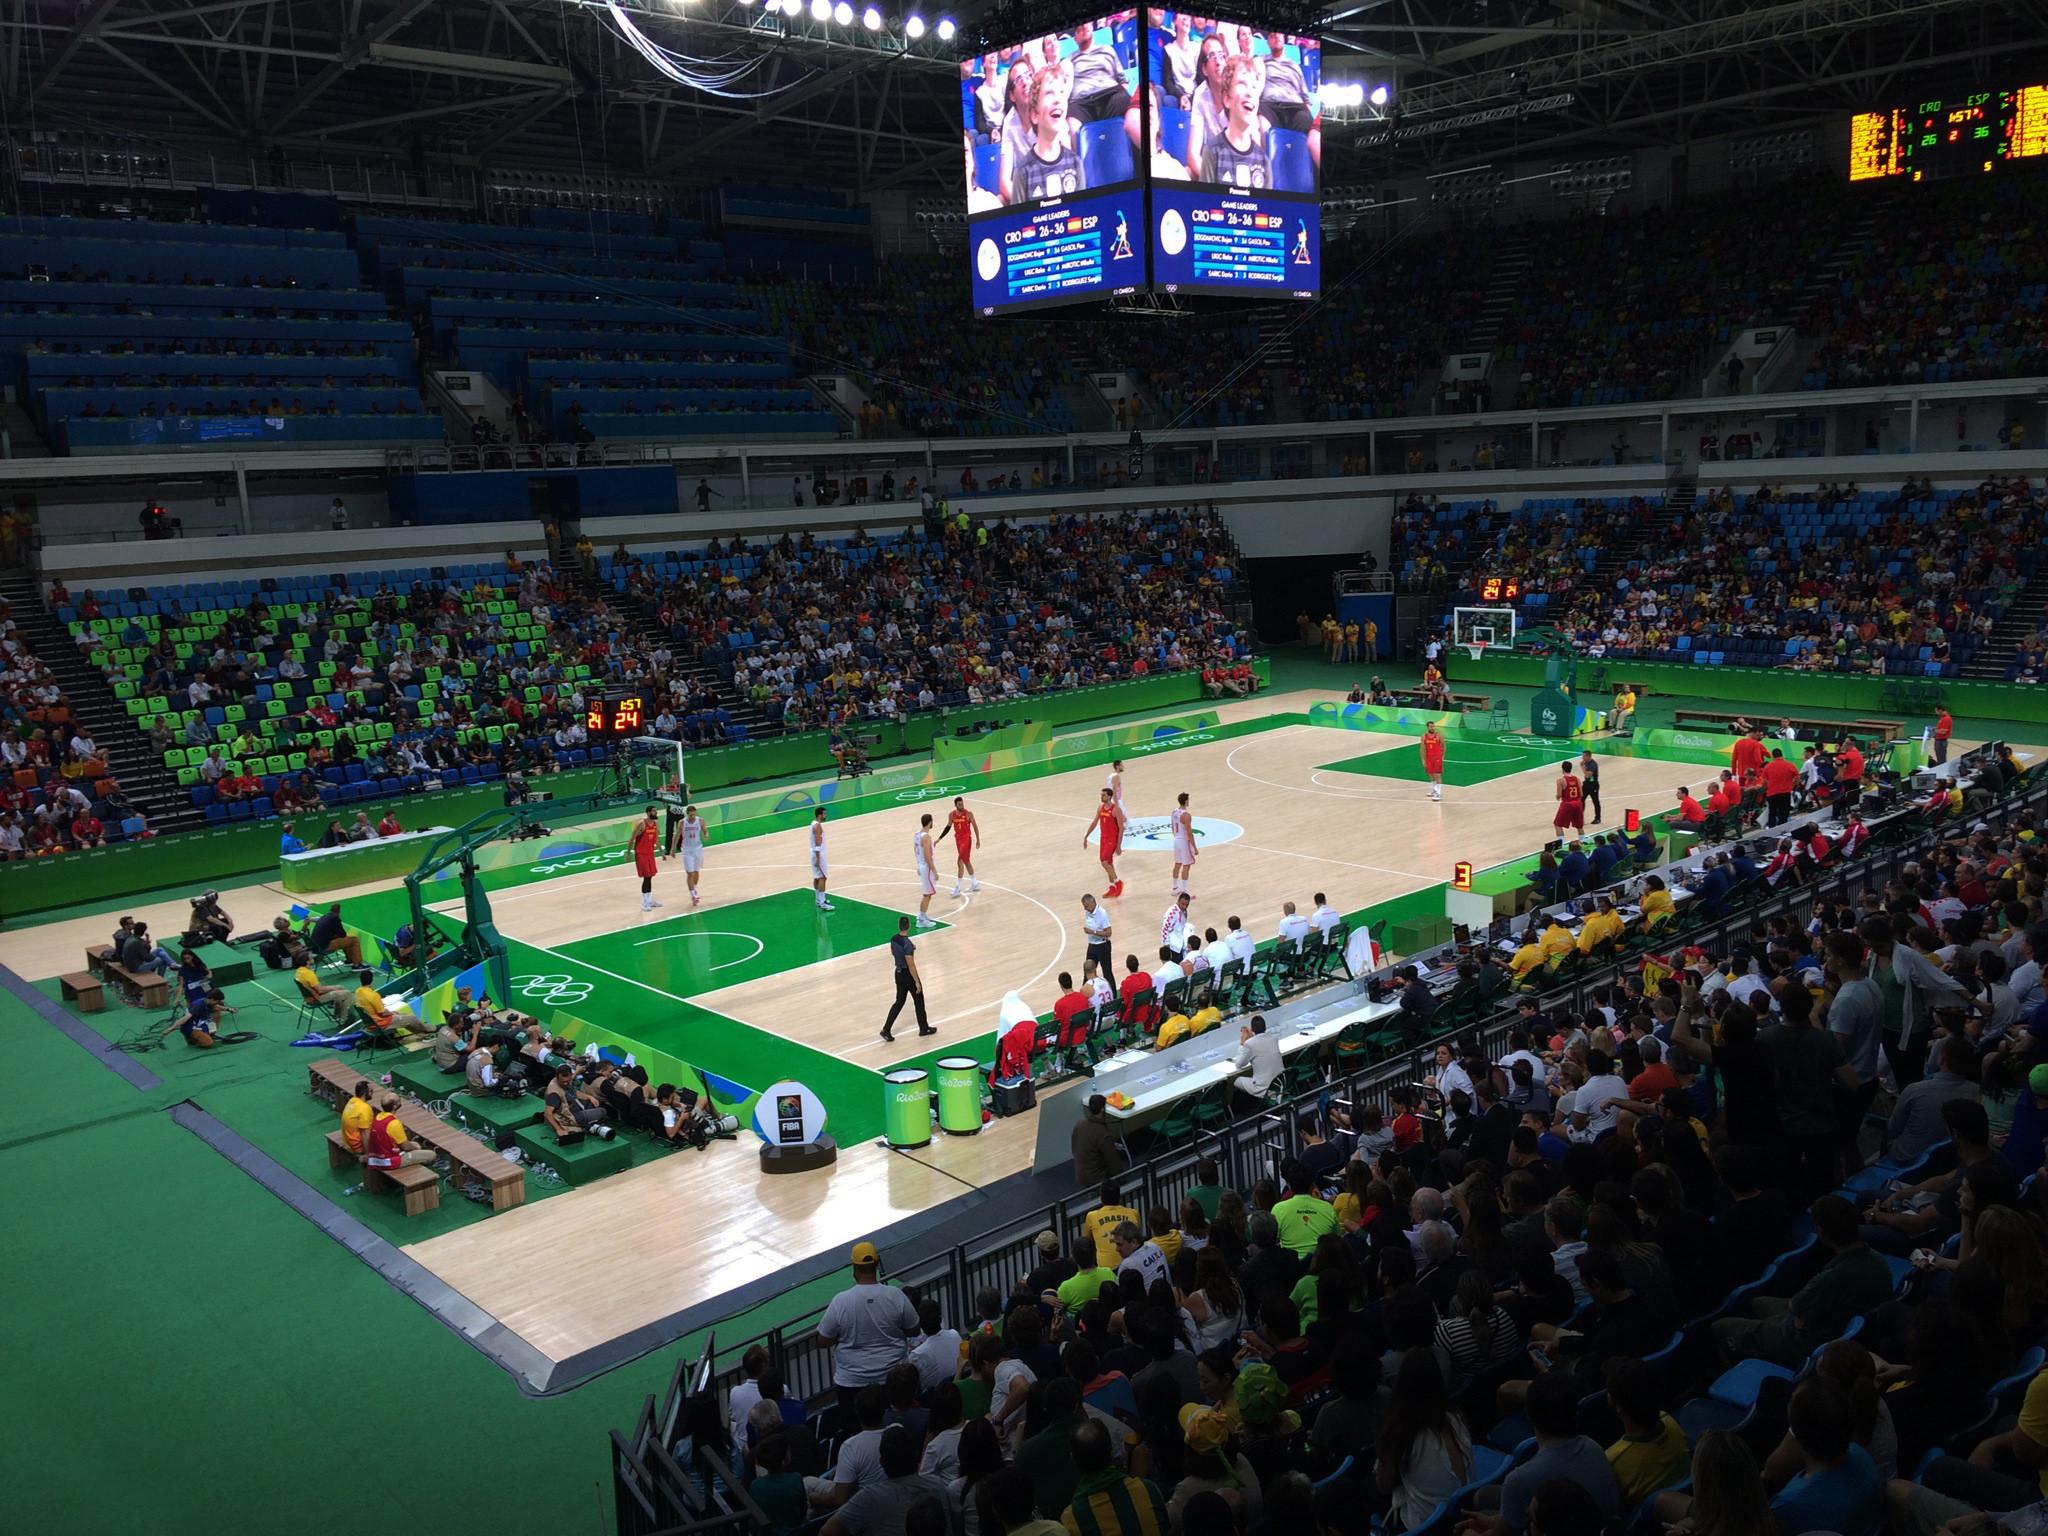 file spain vs croatia olympic basketball tournament carioca arena 1 rio de janeiro brazil. Black Bedroom Furniture Sets. Home Design Ideas